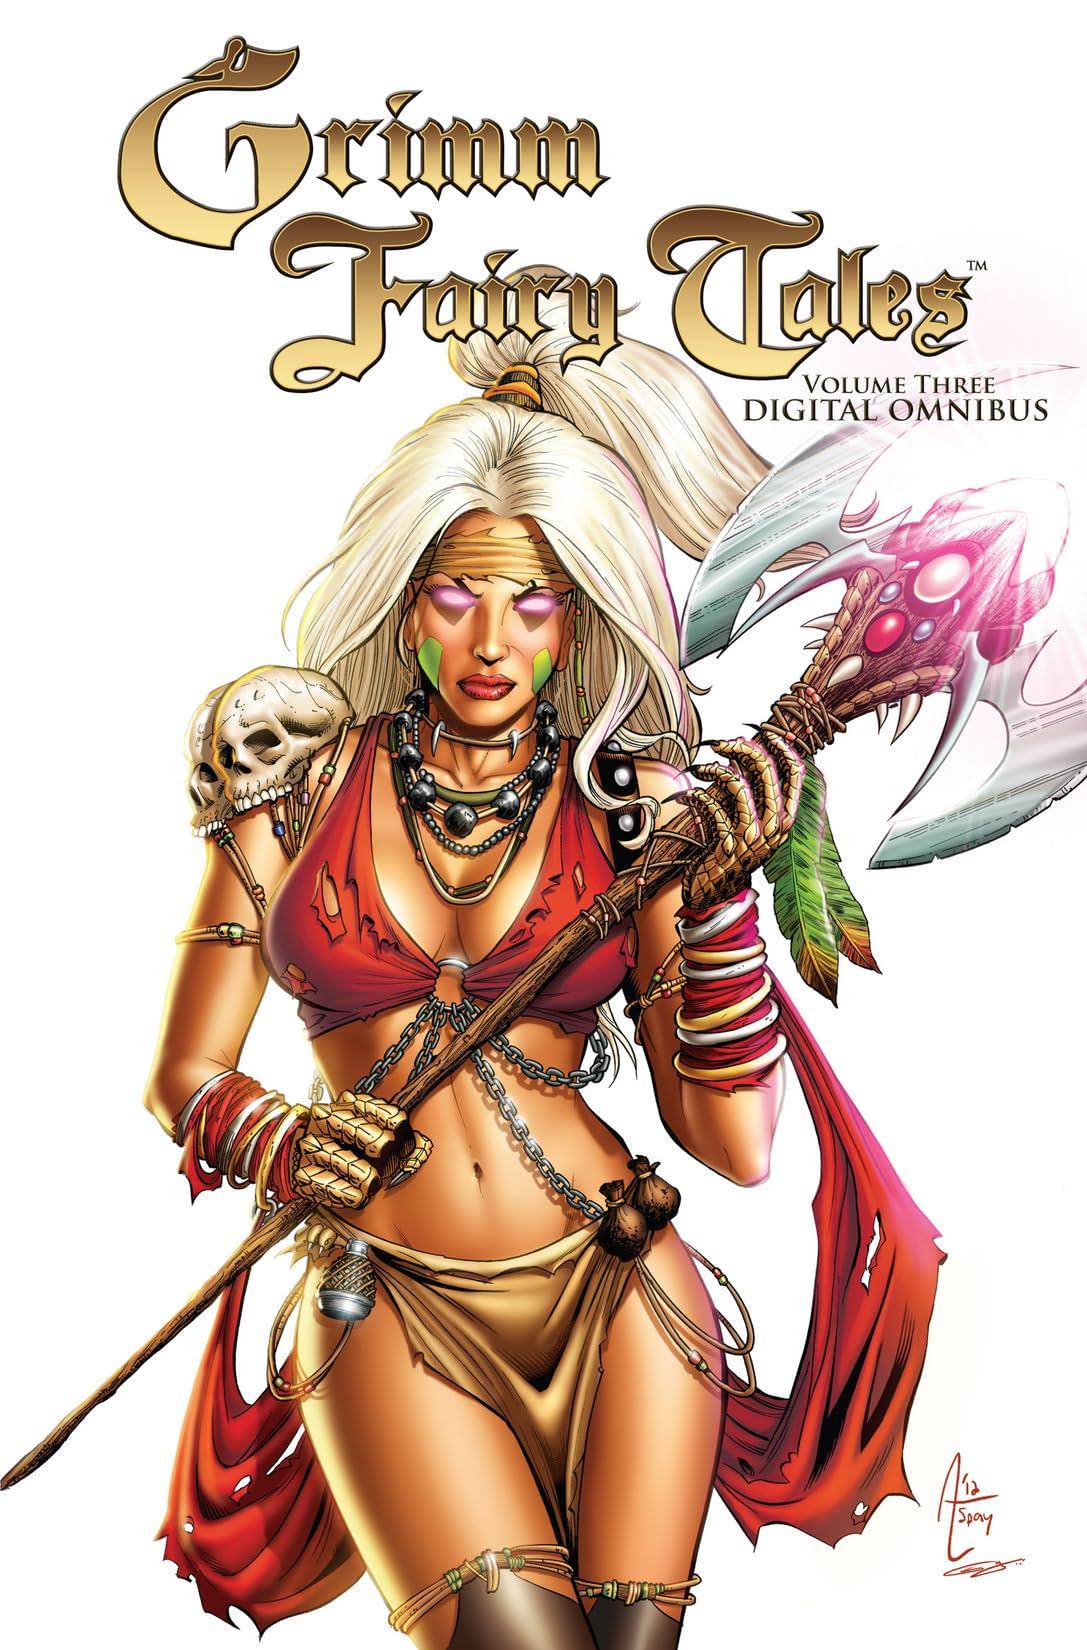 Grimm Fairy Tales Digital Omnibus Vol. 3